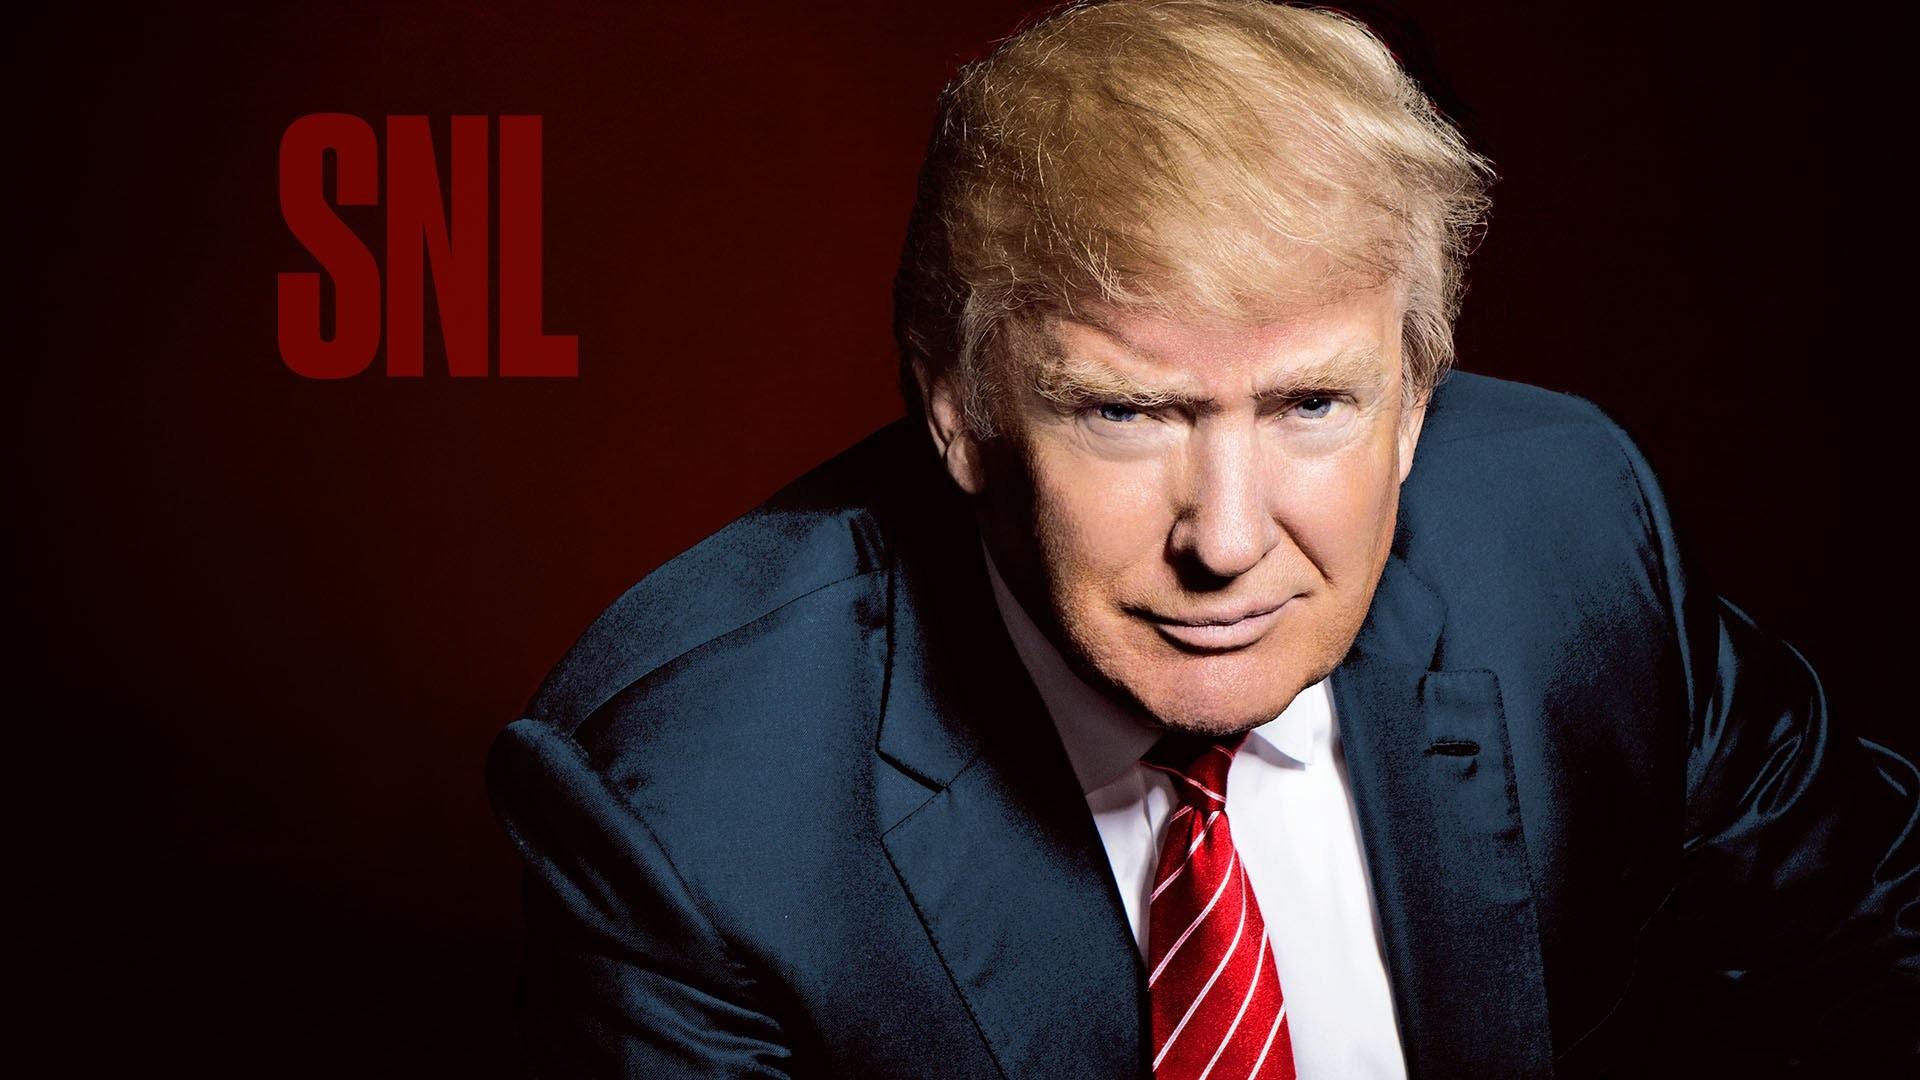 Saturday Night Live – Donald Trump – November 7, 2015